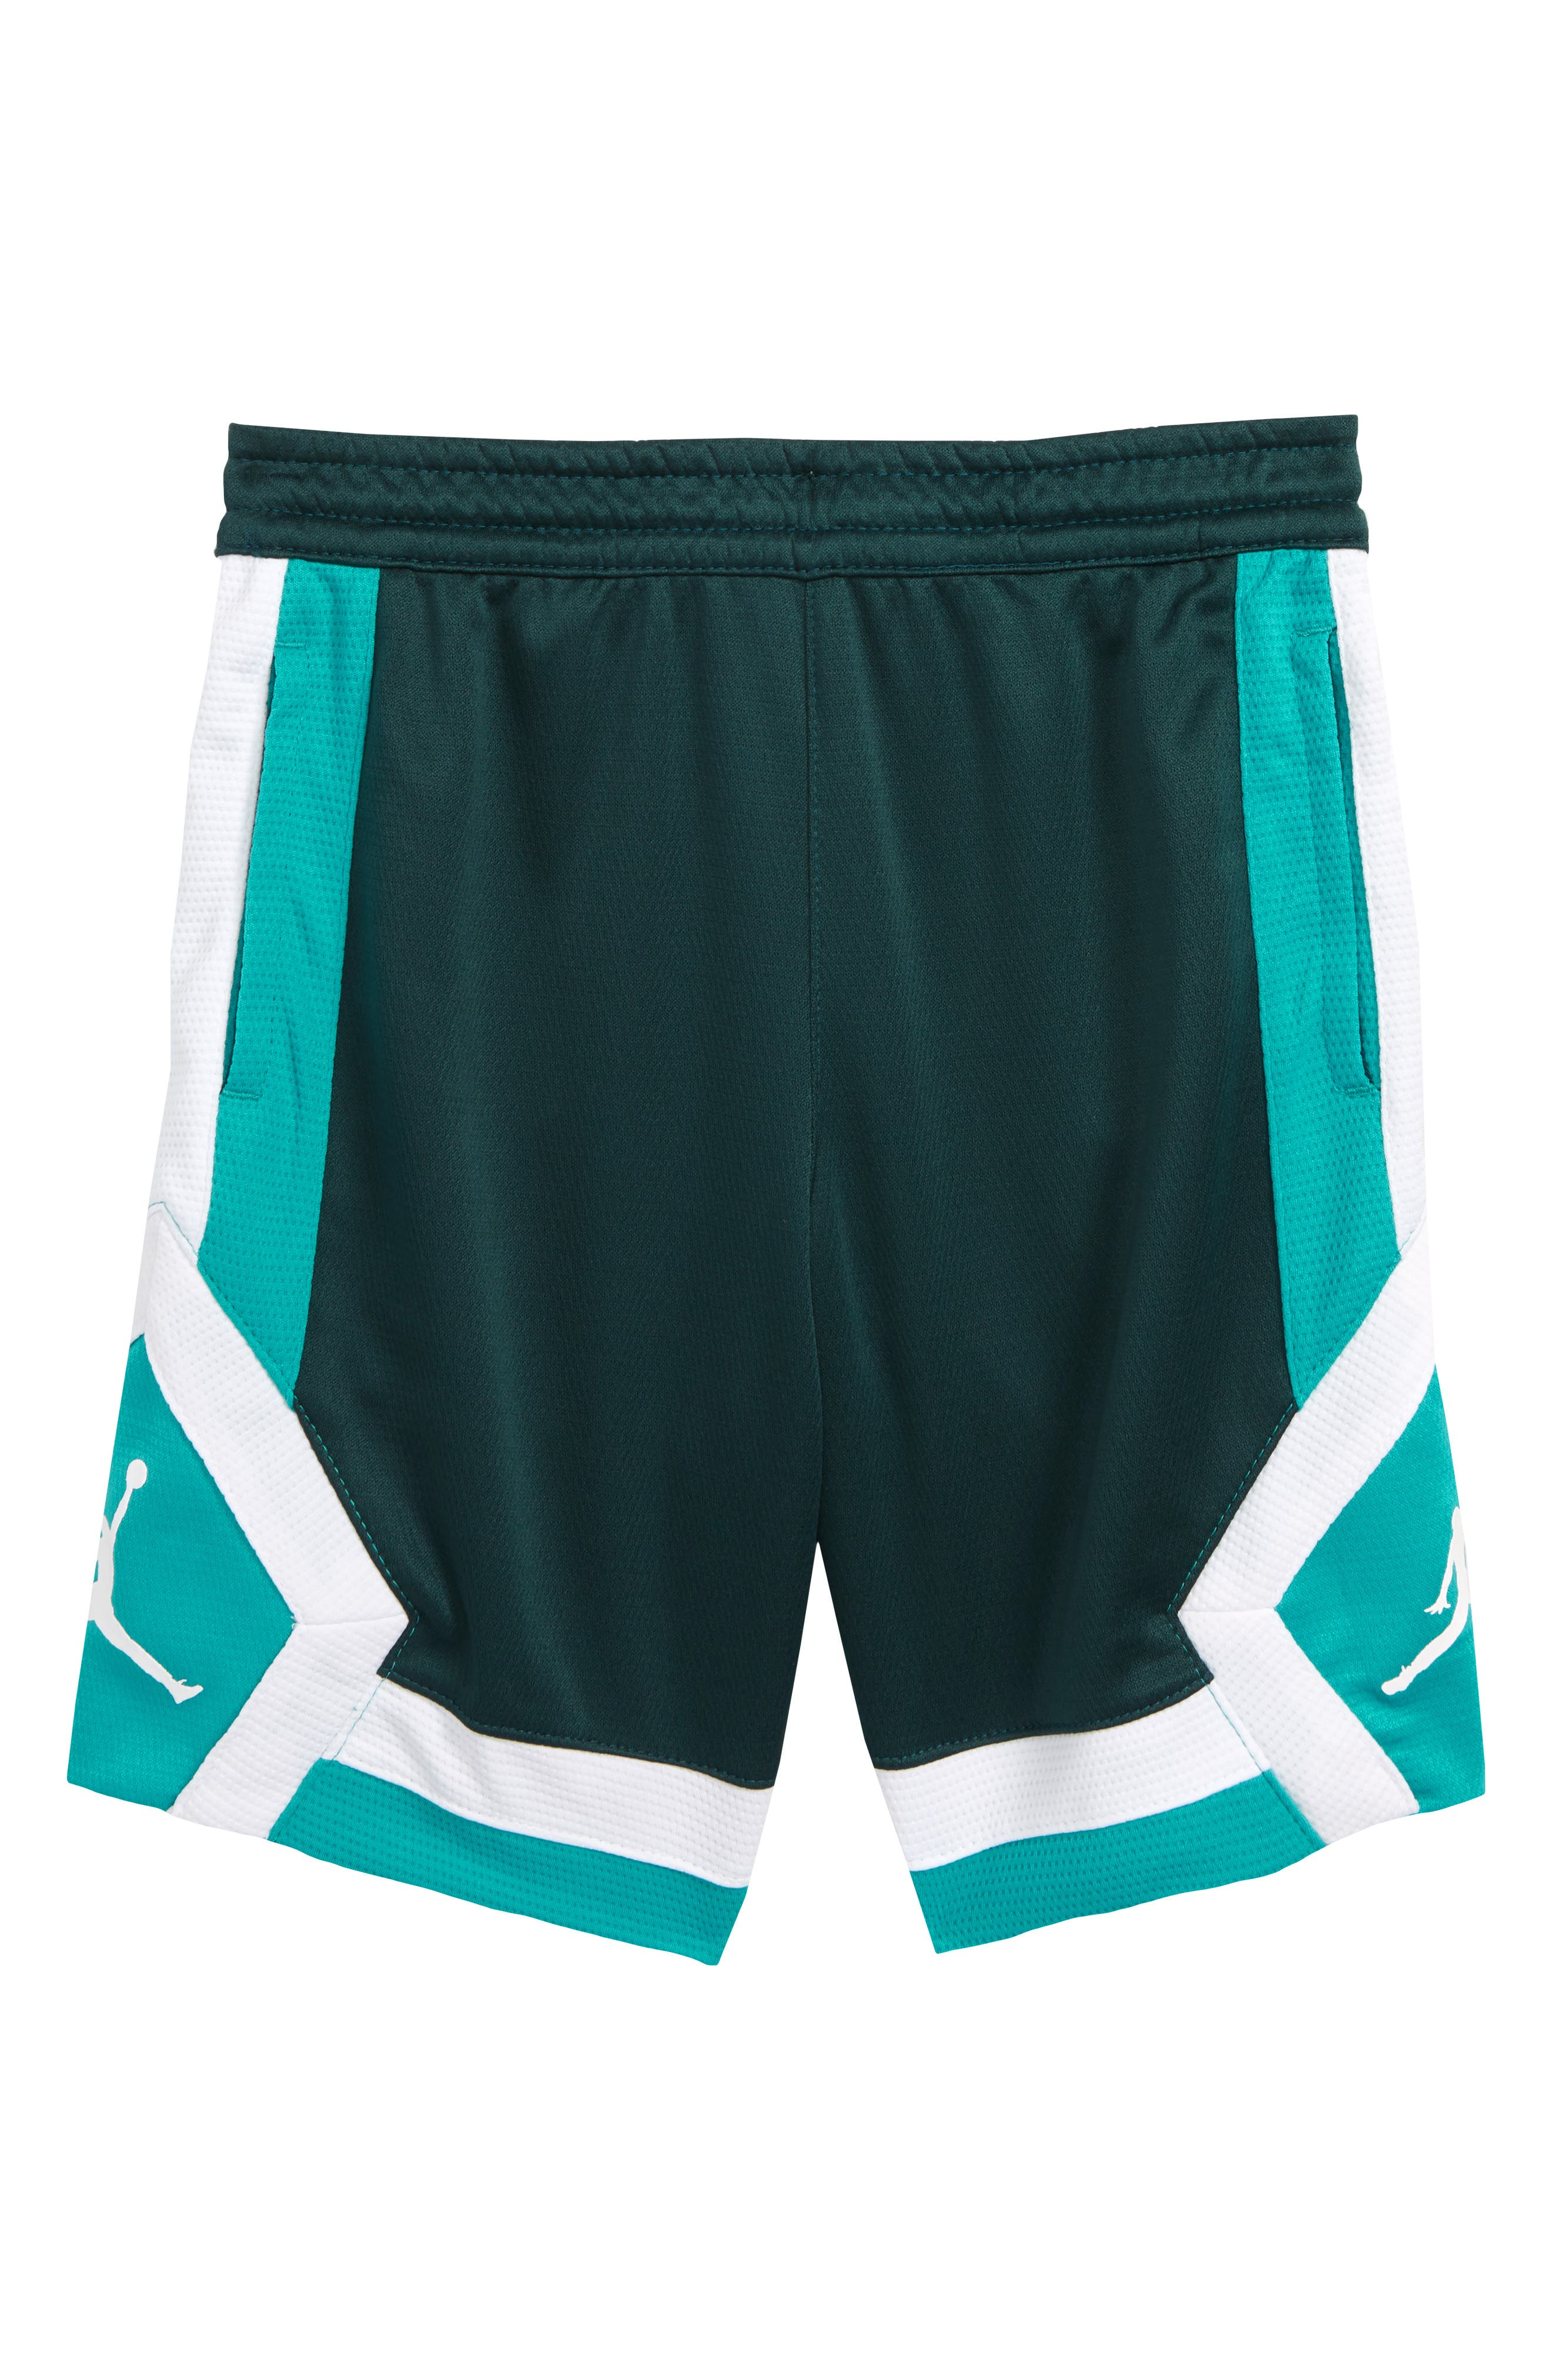 Jordan Rise Athletic Shorts,                             Main thumbnail 1, color,                             MIDNIGHT SPRUCE